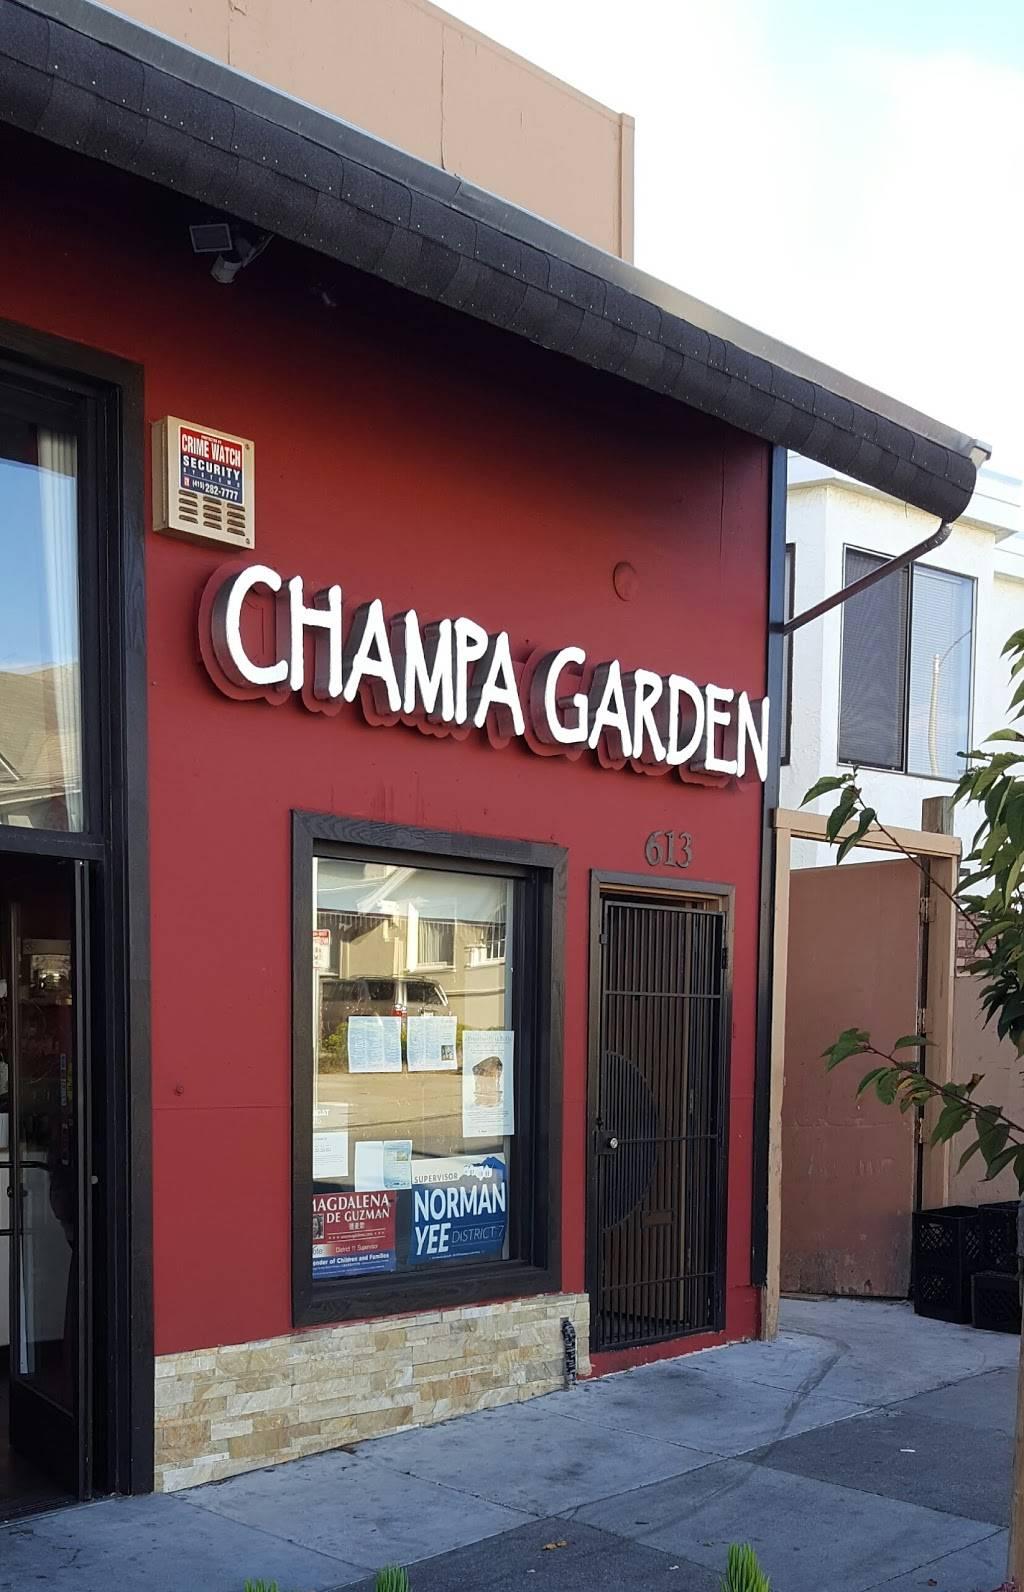 Champa Garden Restaurant 613 Faxon Ave San Francisco Ca 94112 Usa